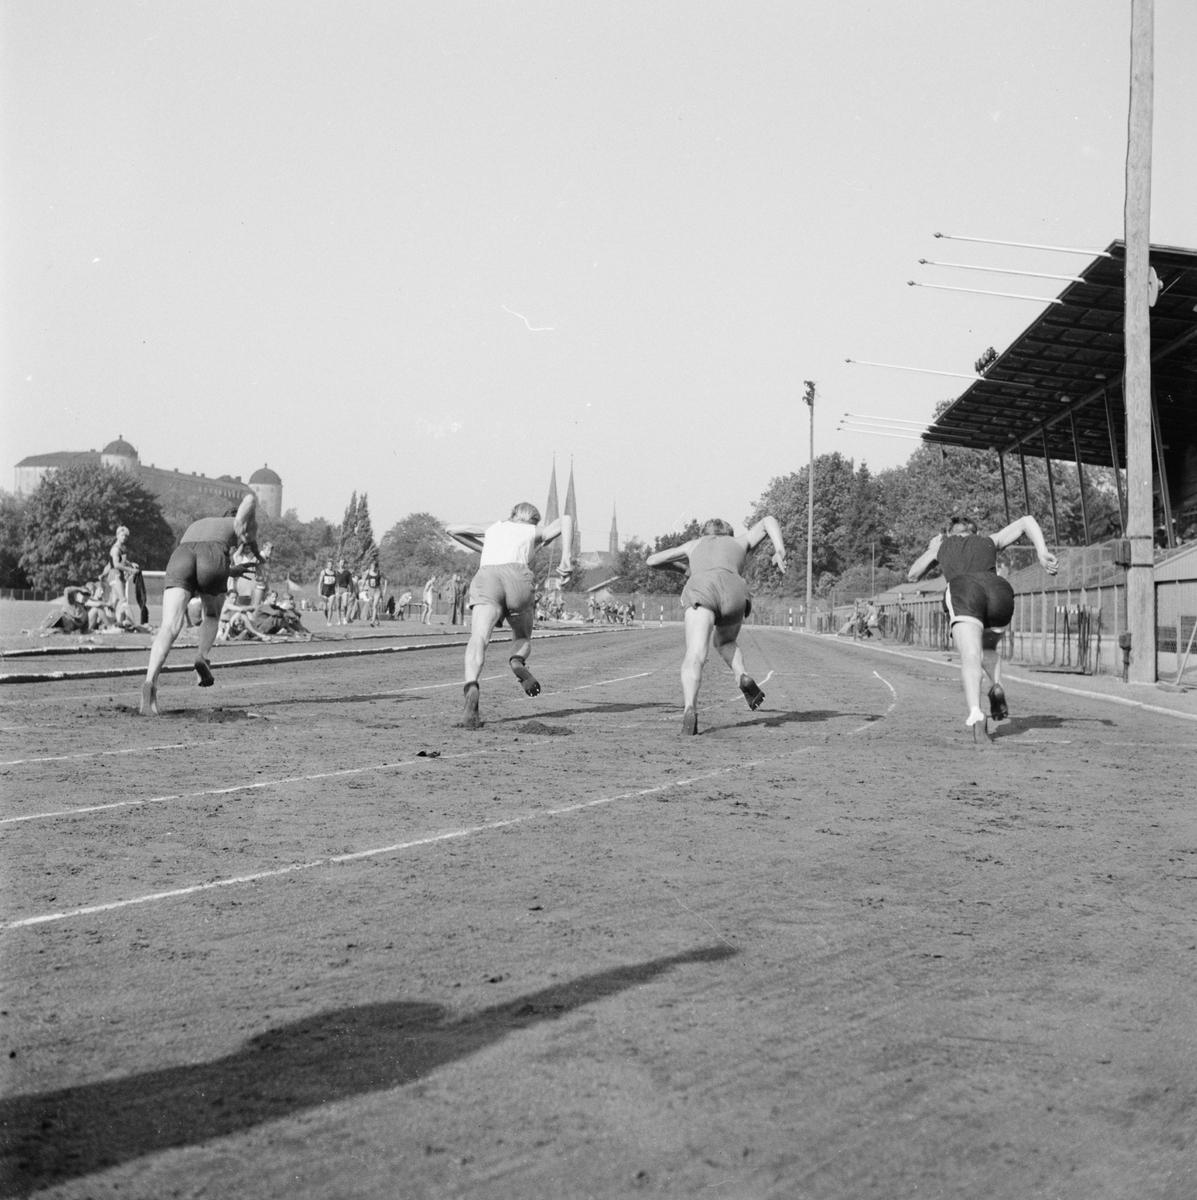 Friidrott skolungdom, Studenternas Idrottsplats, Uppsala, 1948